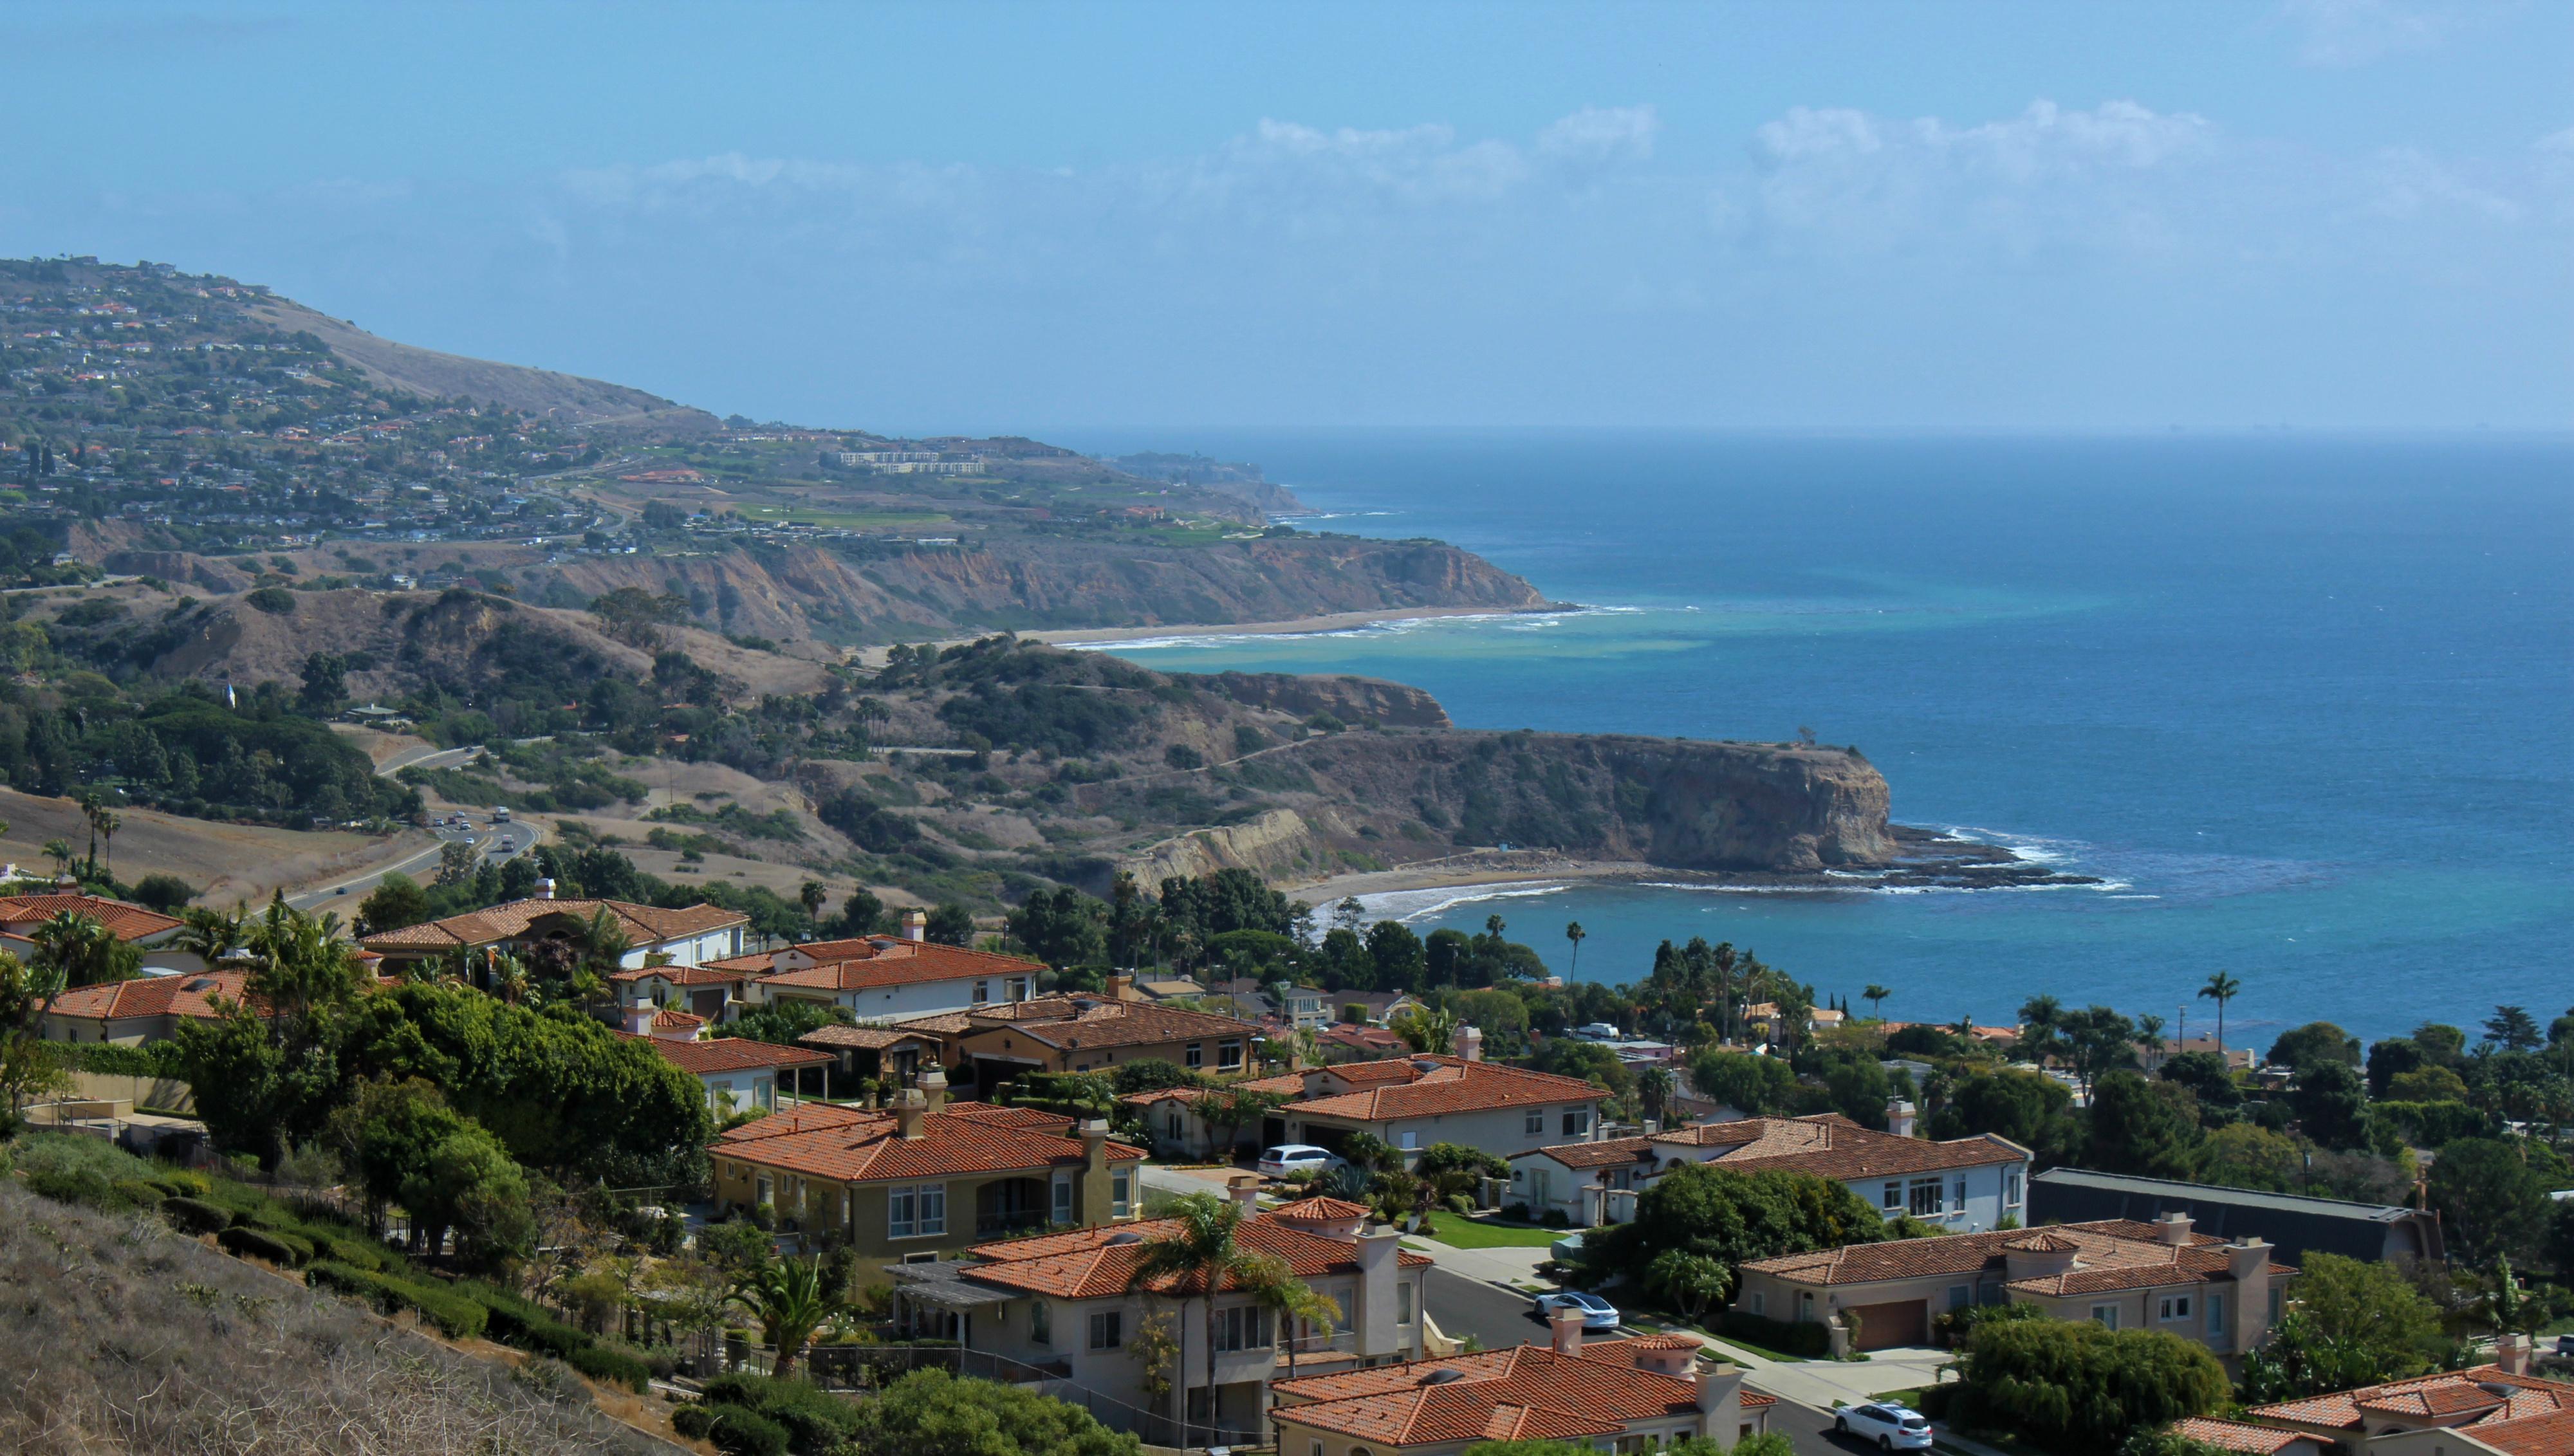 Coastline View of Palos Verdes